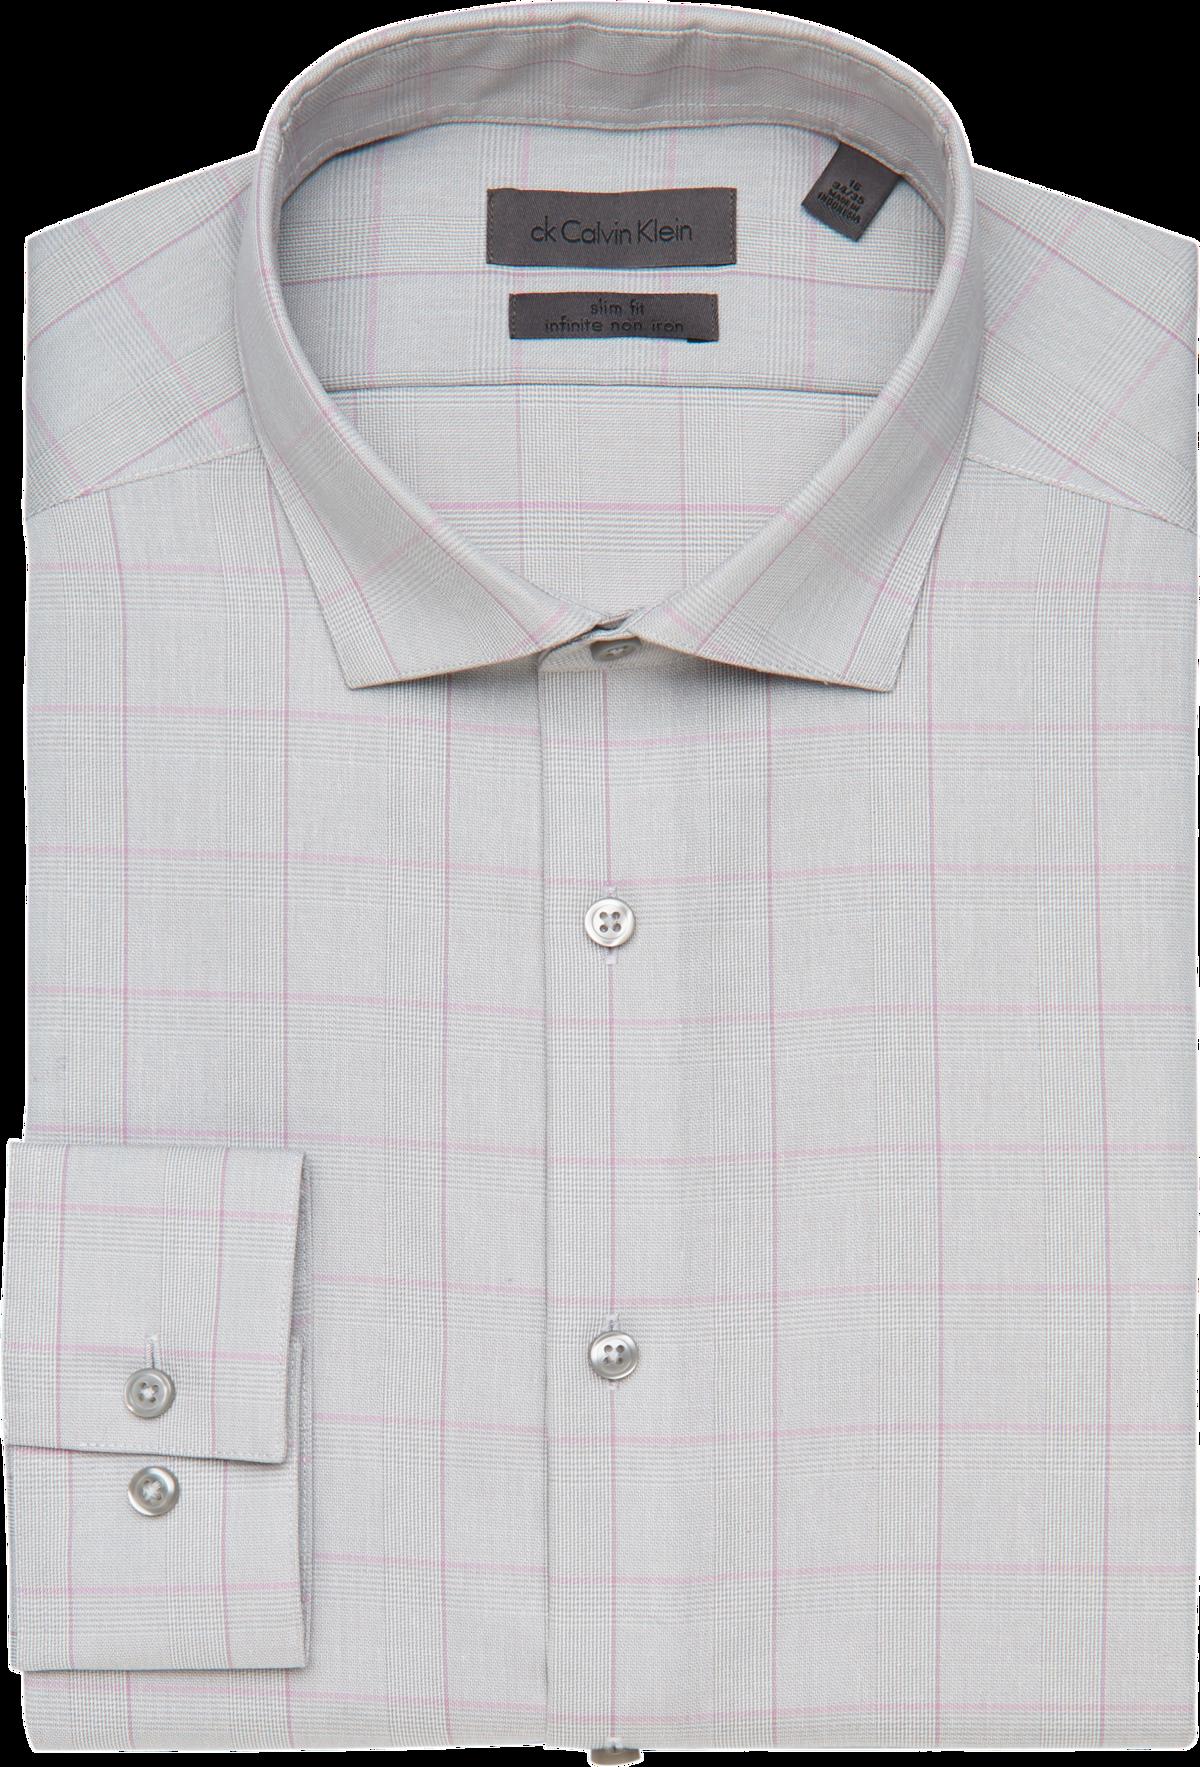 Calvin Klein Dress Shirts - Men's Dress Shirts | Men's Wearhouse